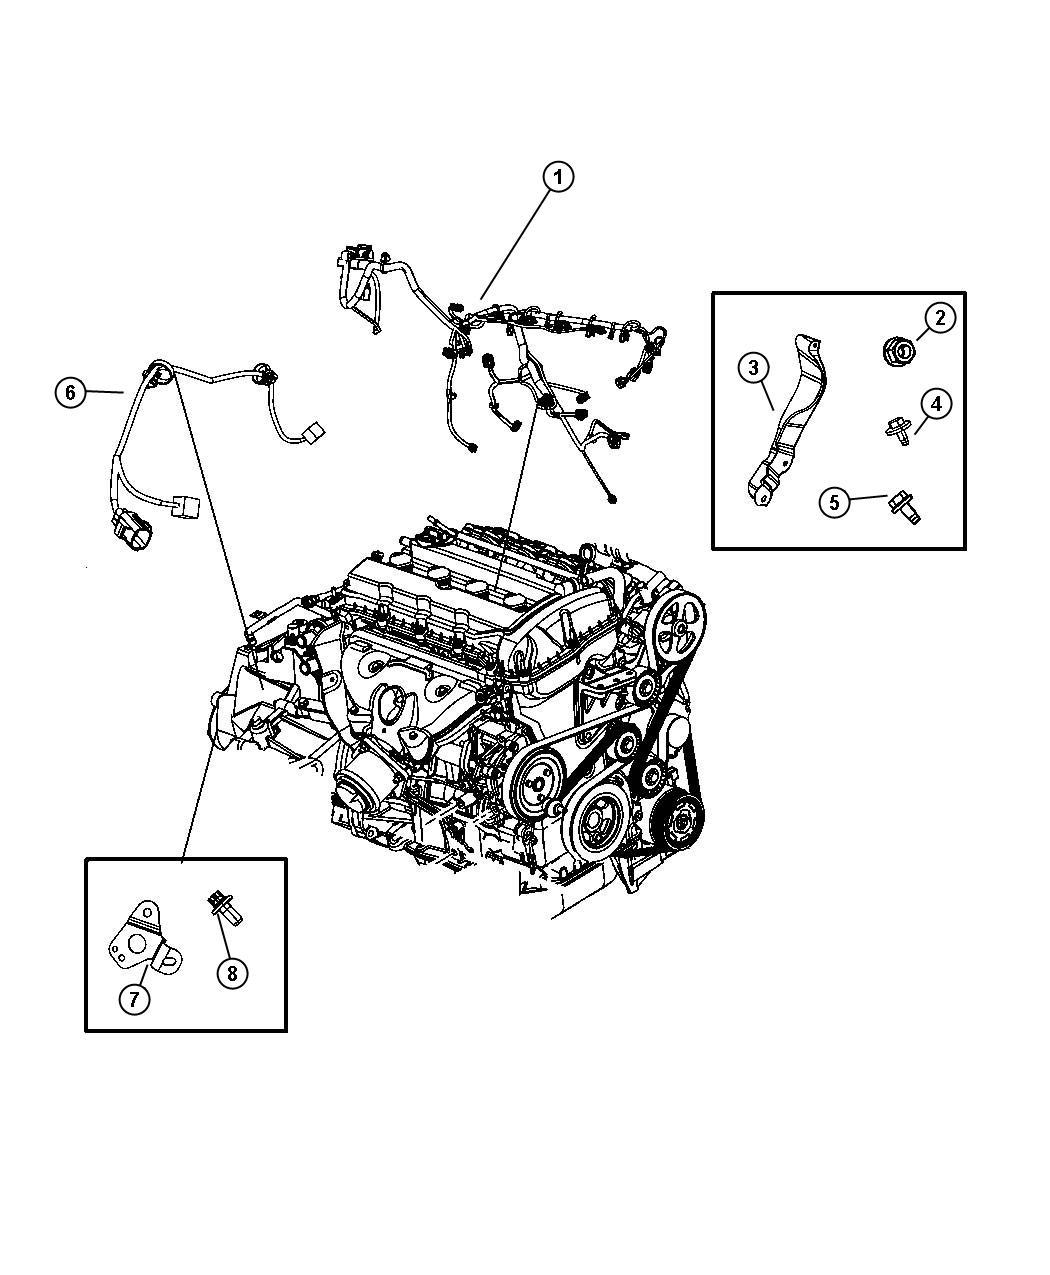 Dodge Caliber Wiring. Powertrain. Lock, disc, brakes